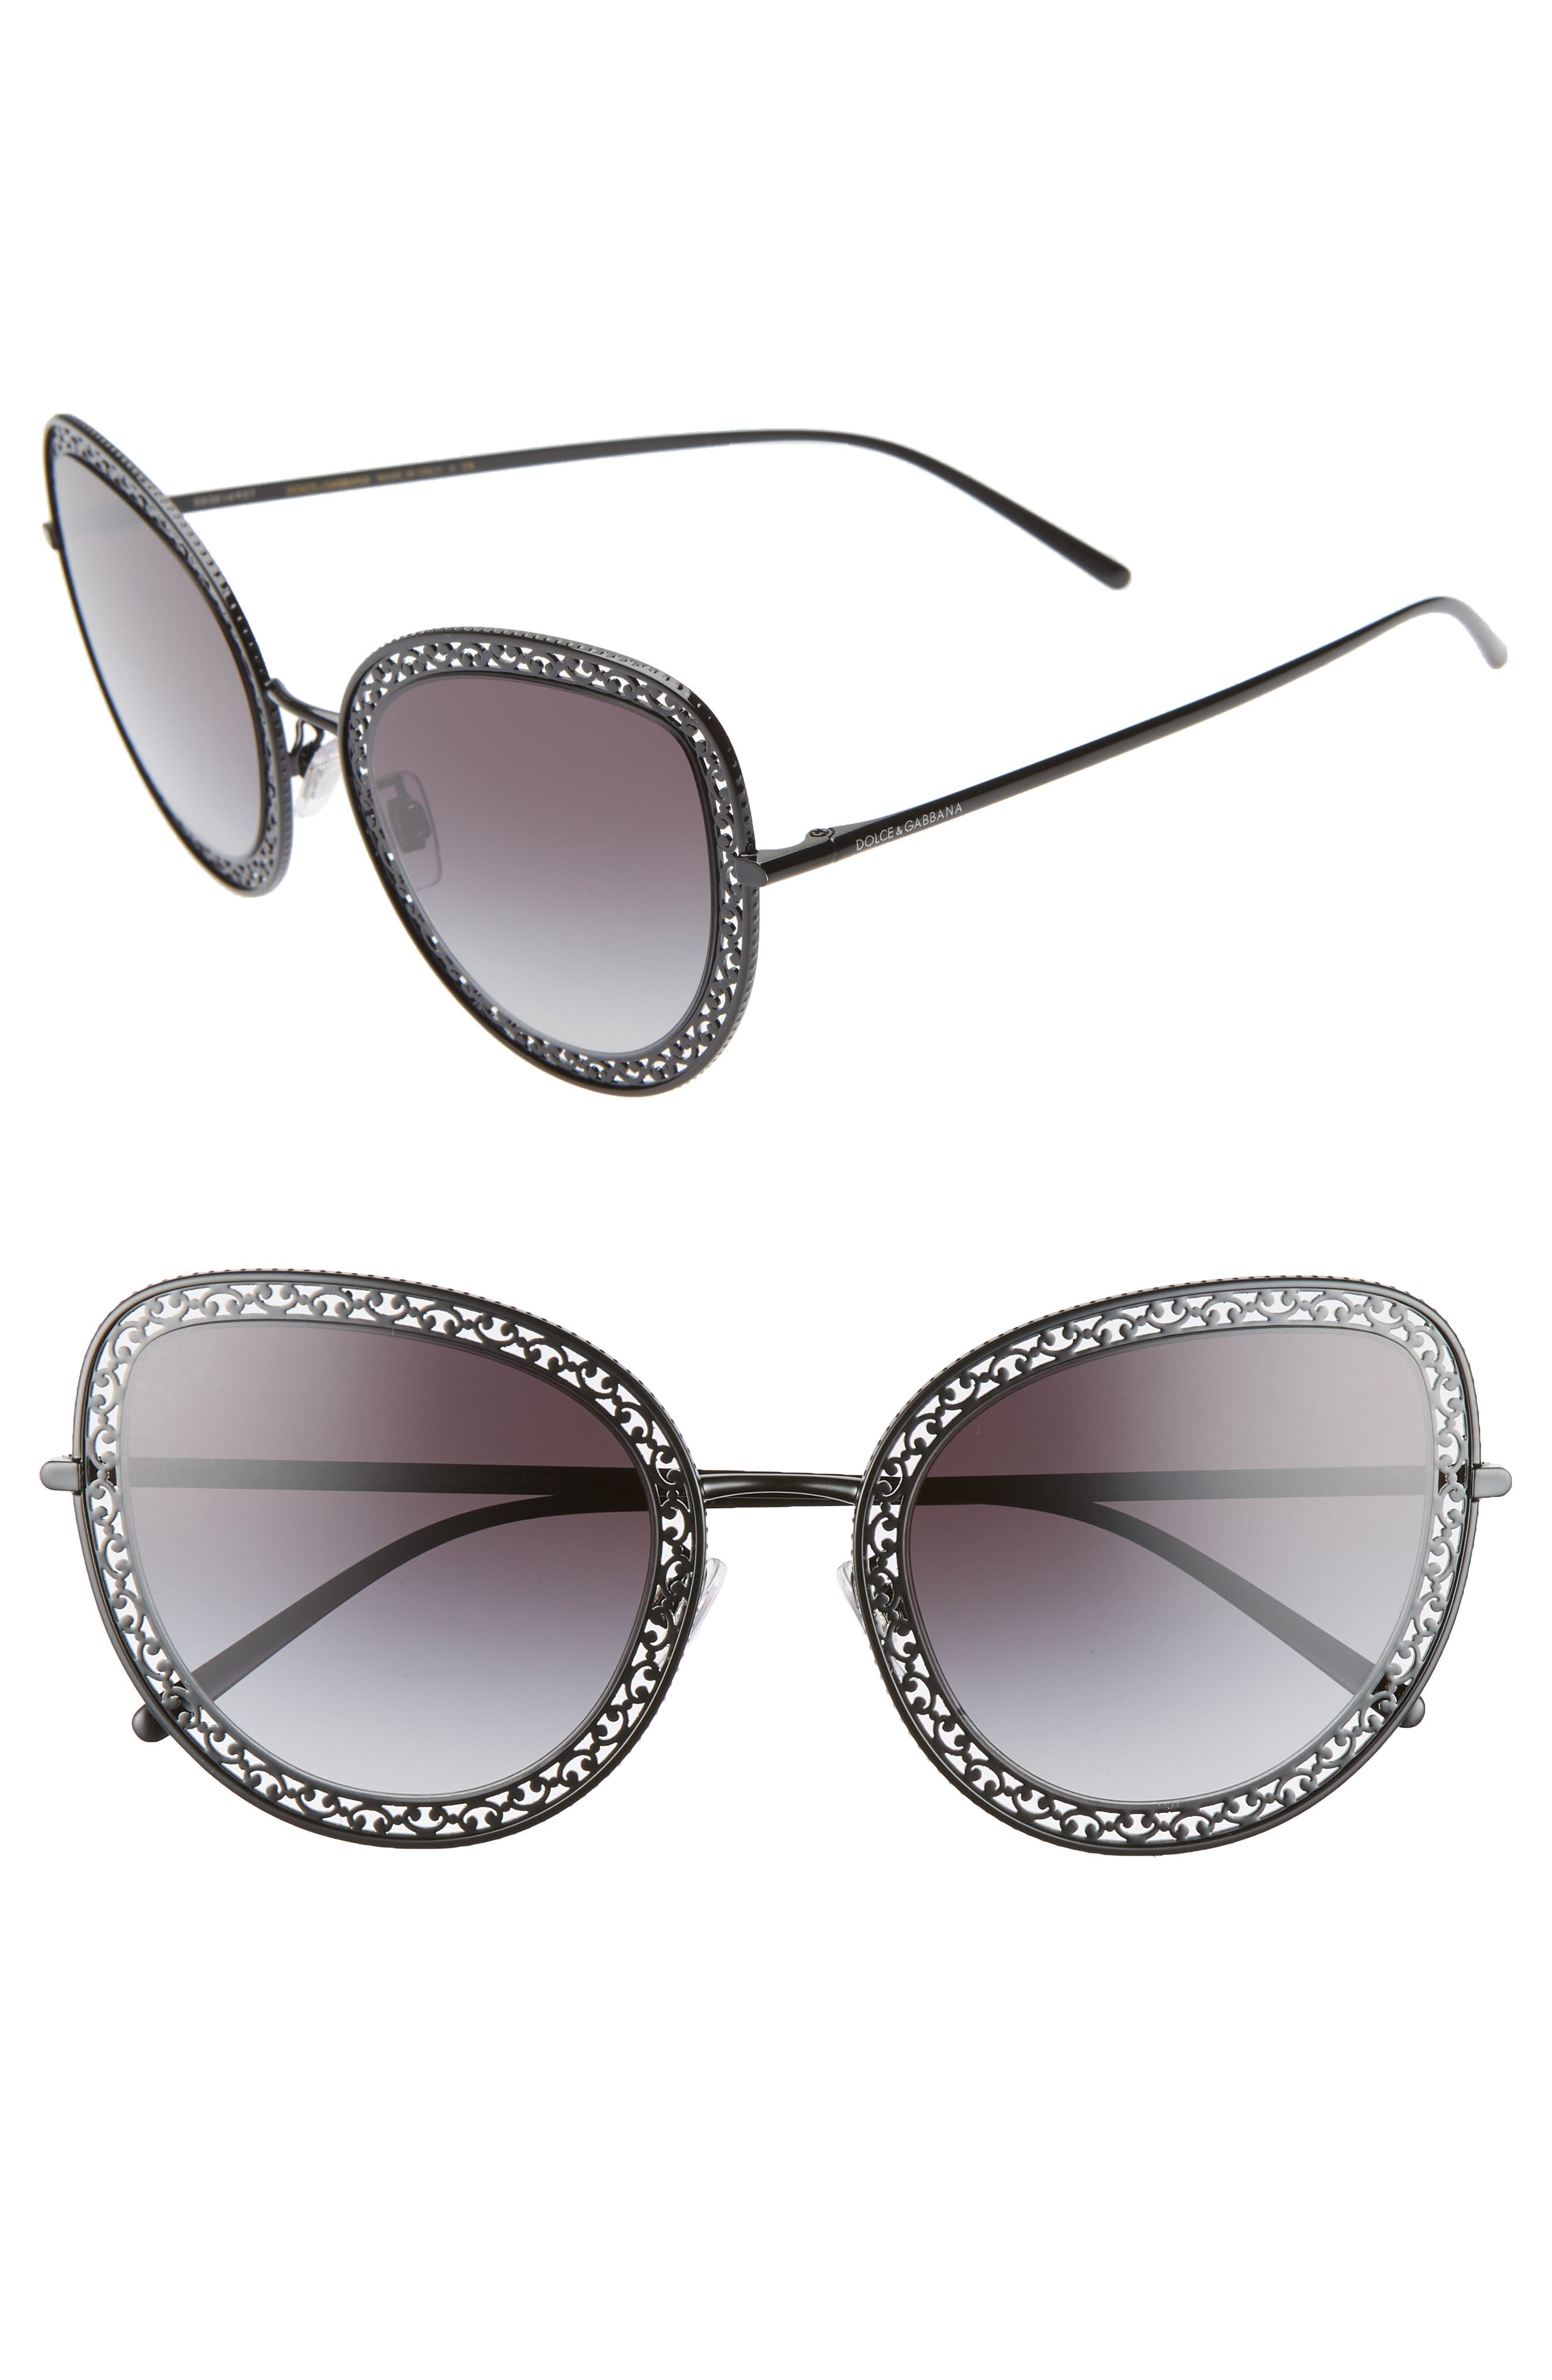 Dolce & gabbana 5m Cat Eye Sunglasses - Black